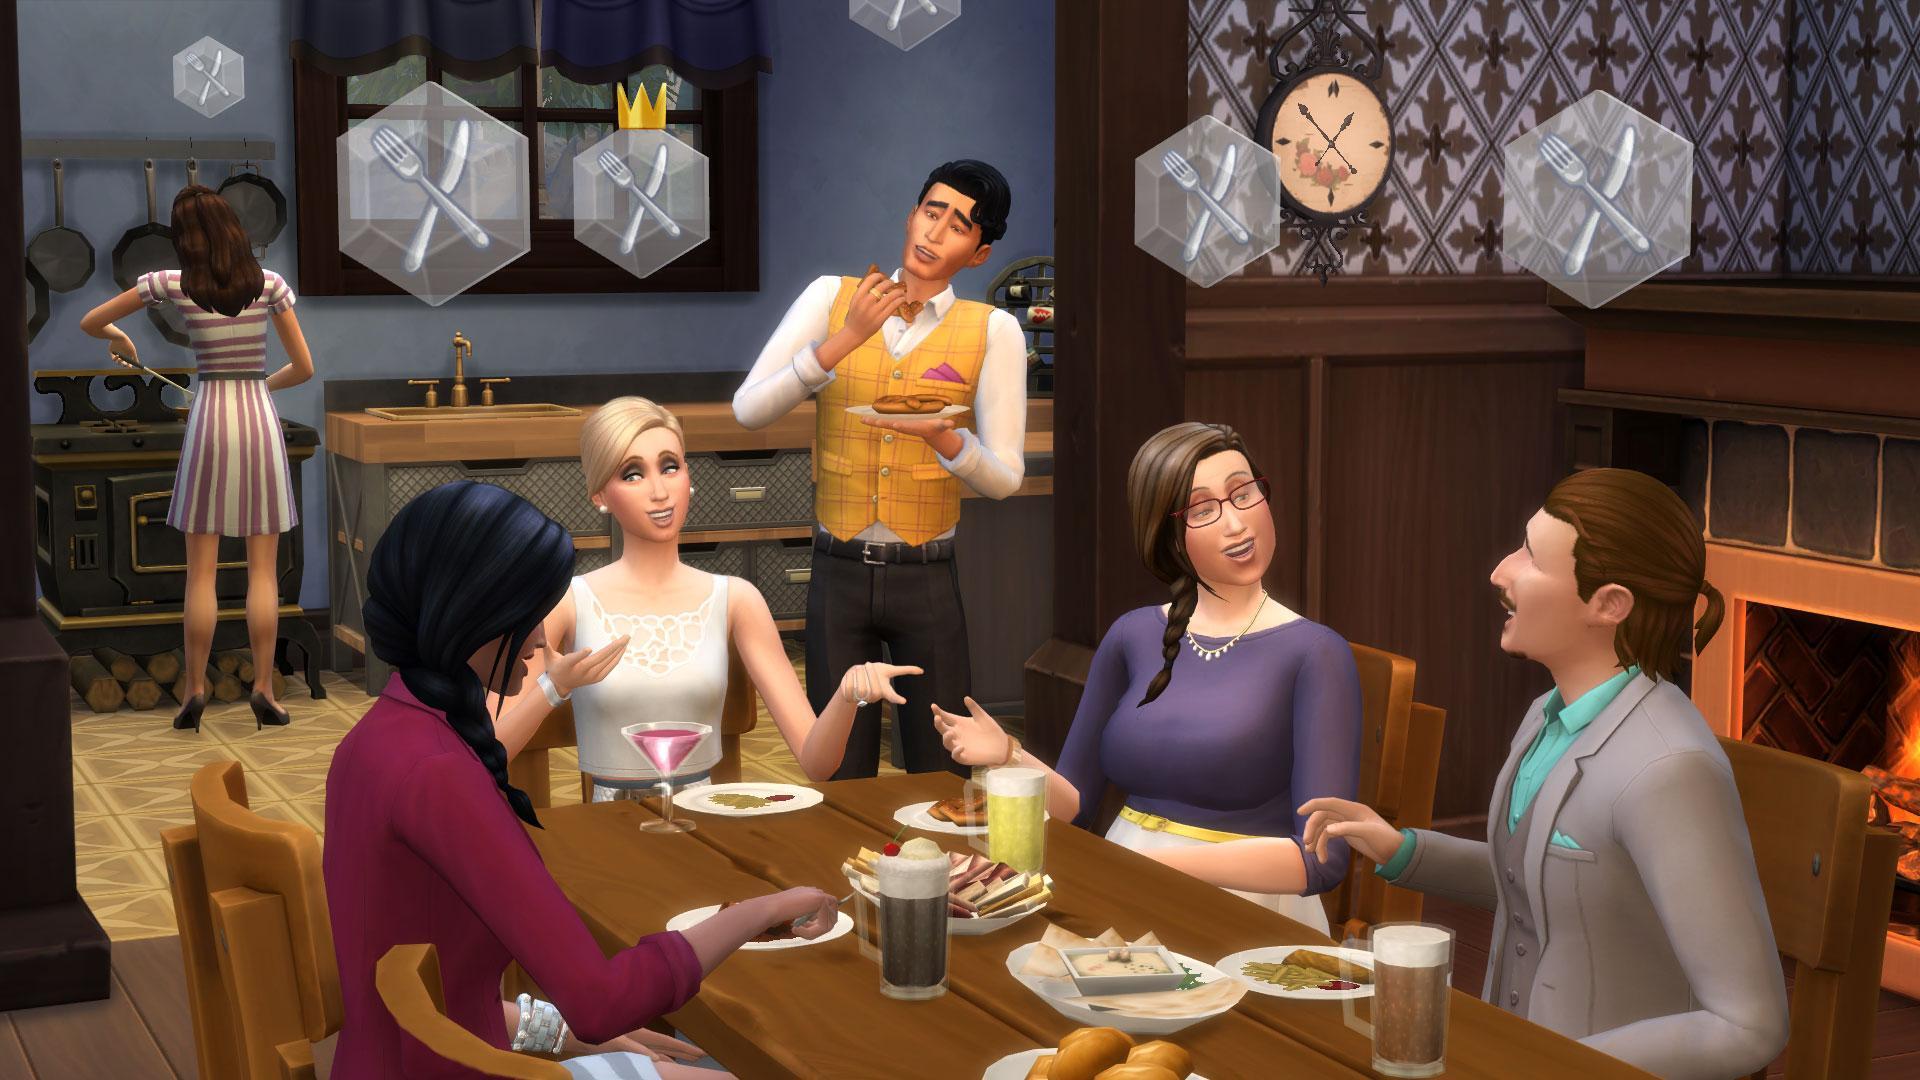 The sims 4 usciamo insieme espansione pc windows for Food bar game